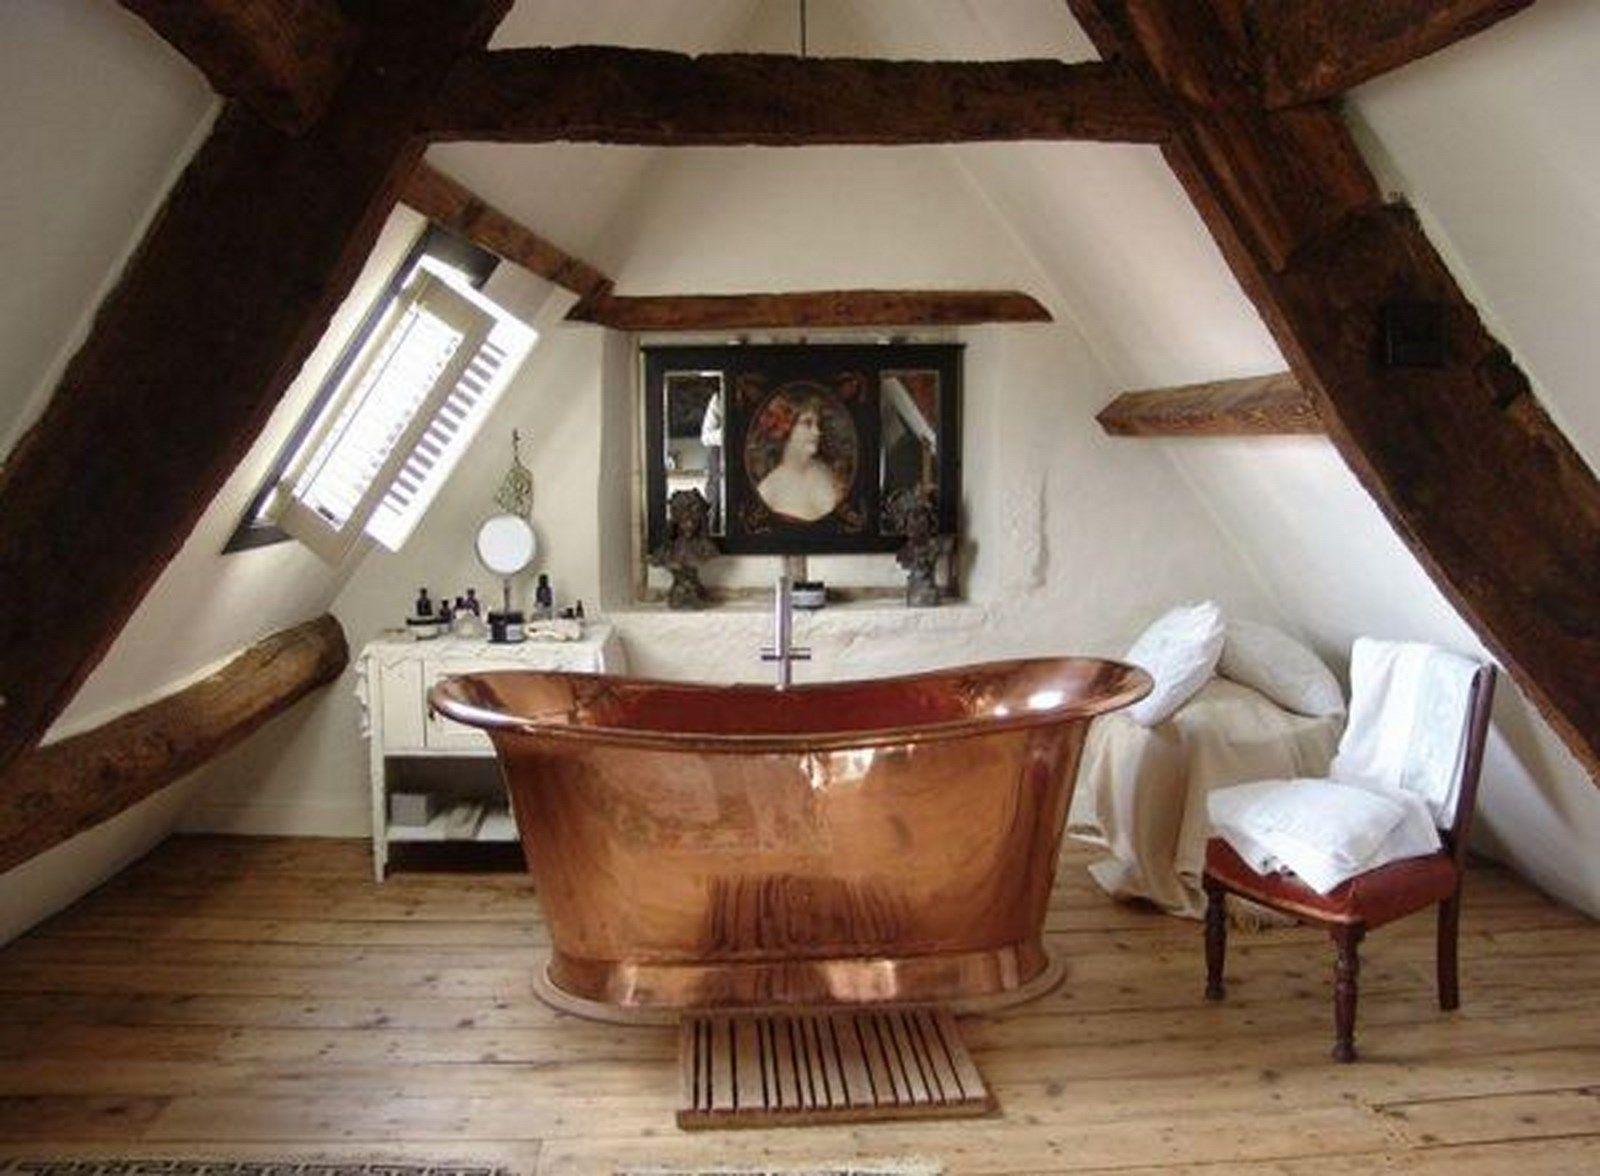 20 Rustic Bathroom Designs With Copper Bathtub | Attic bathroom ...